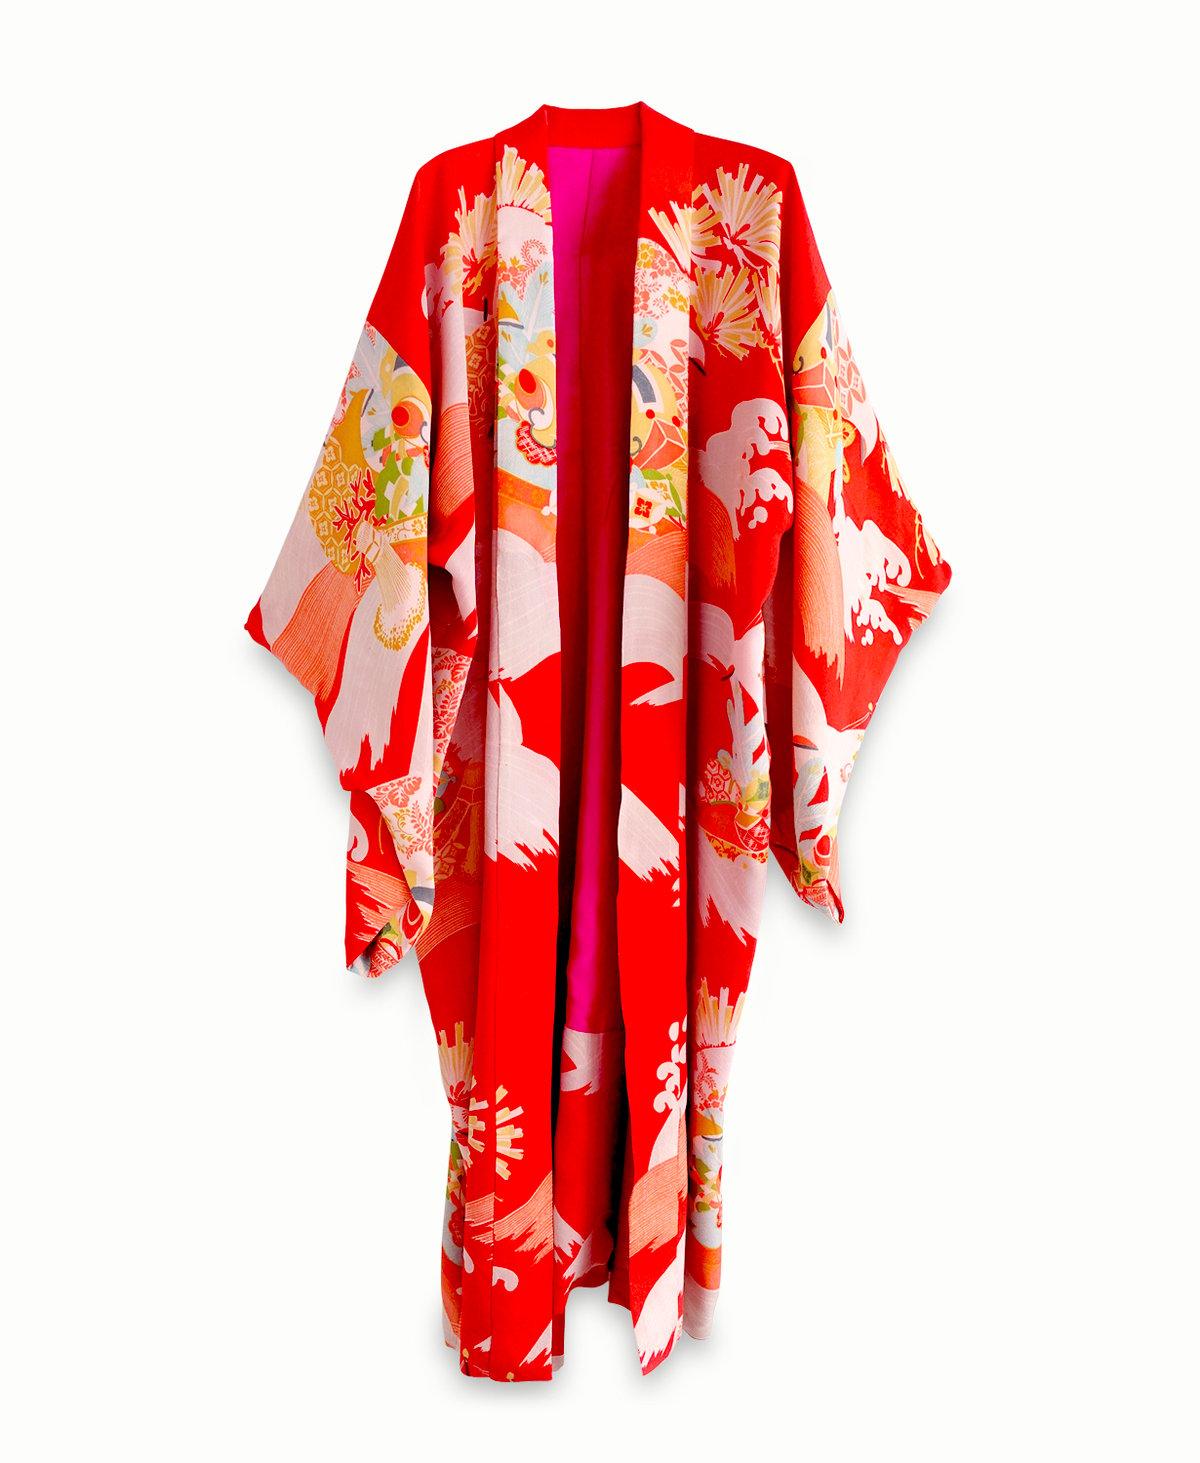 Image of Rød silke kimono med bølger - vendbar